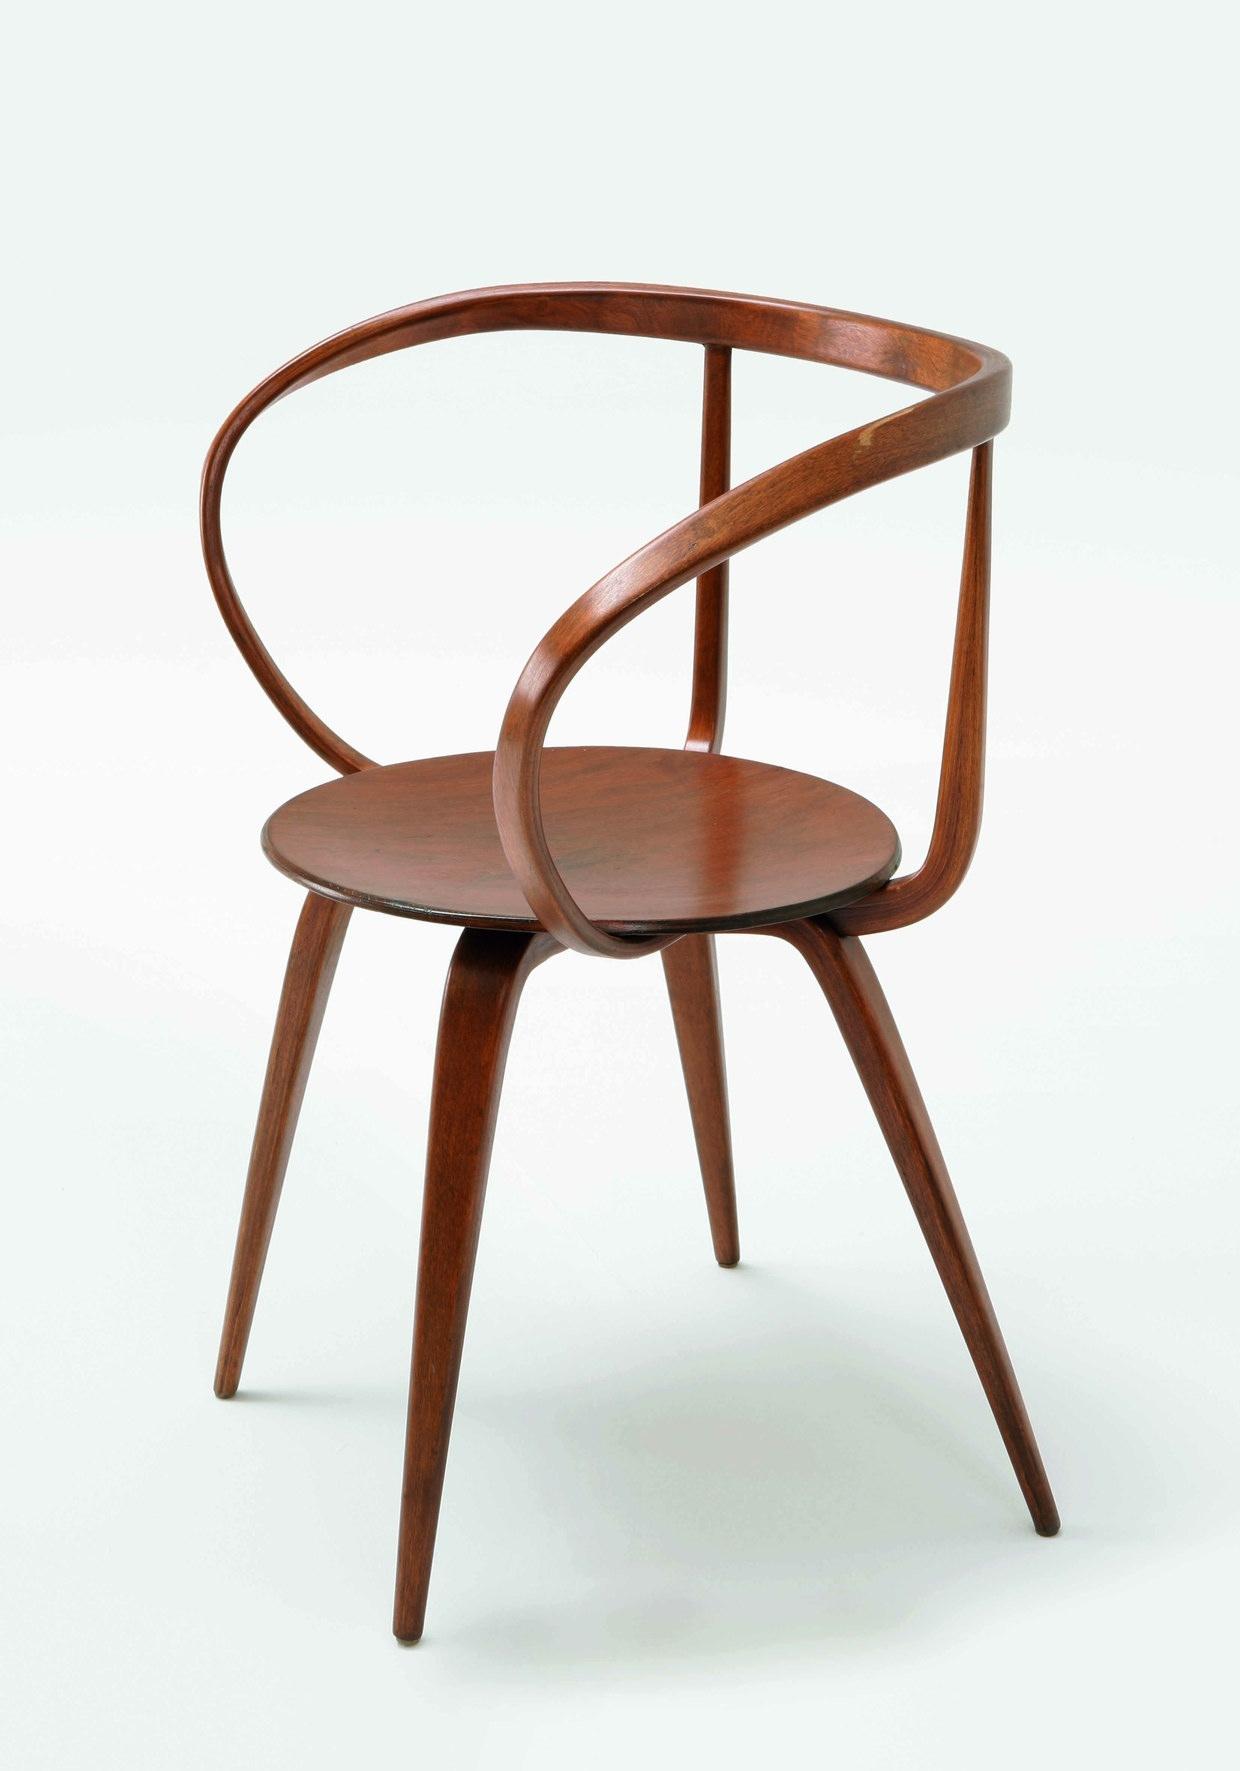 chair design museum folding cap covers vitra george nelson installation karmatrendz